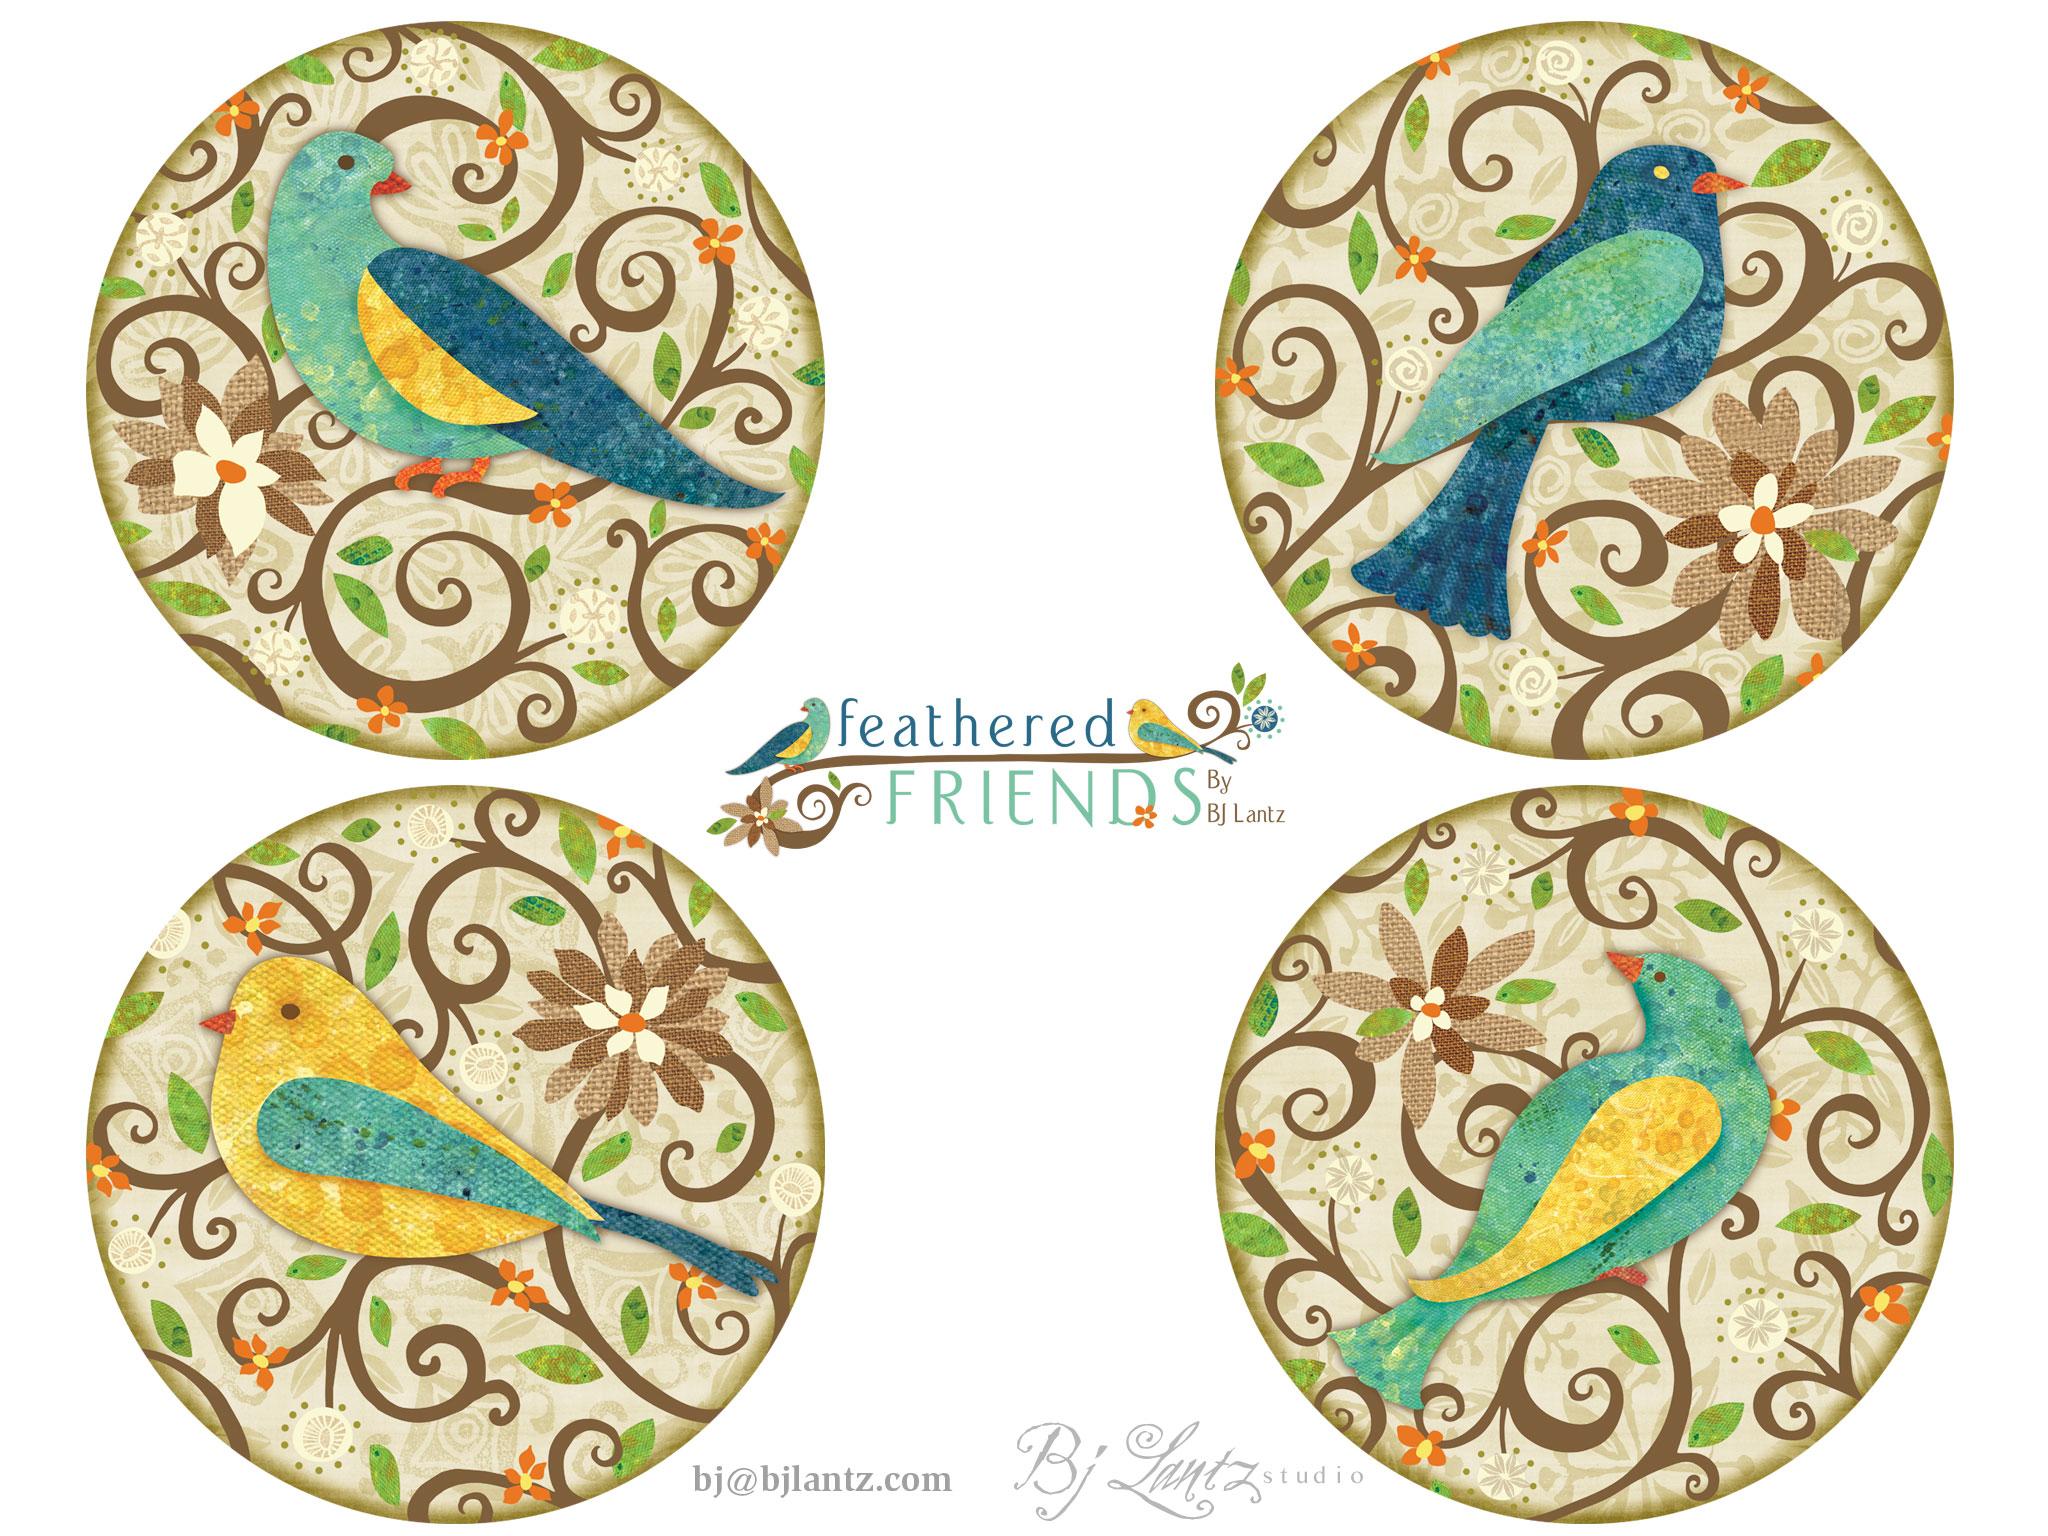 FeatheredFriends_6_BJLantz_portfolio.jpg